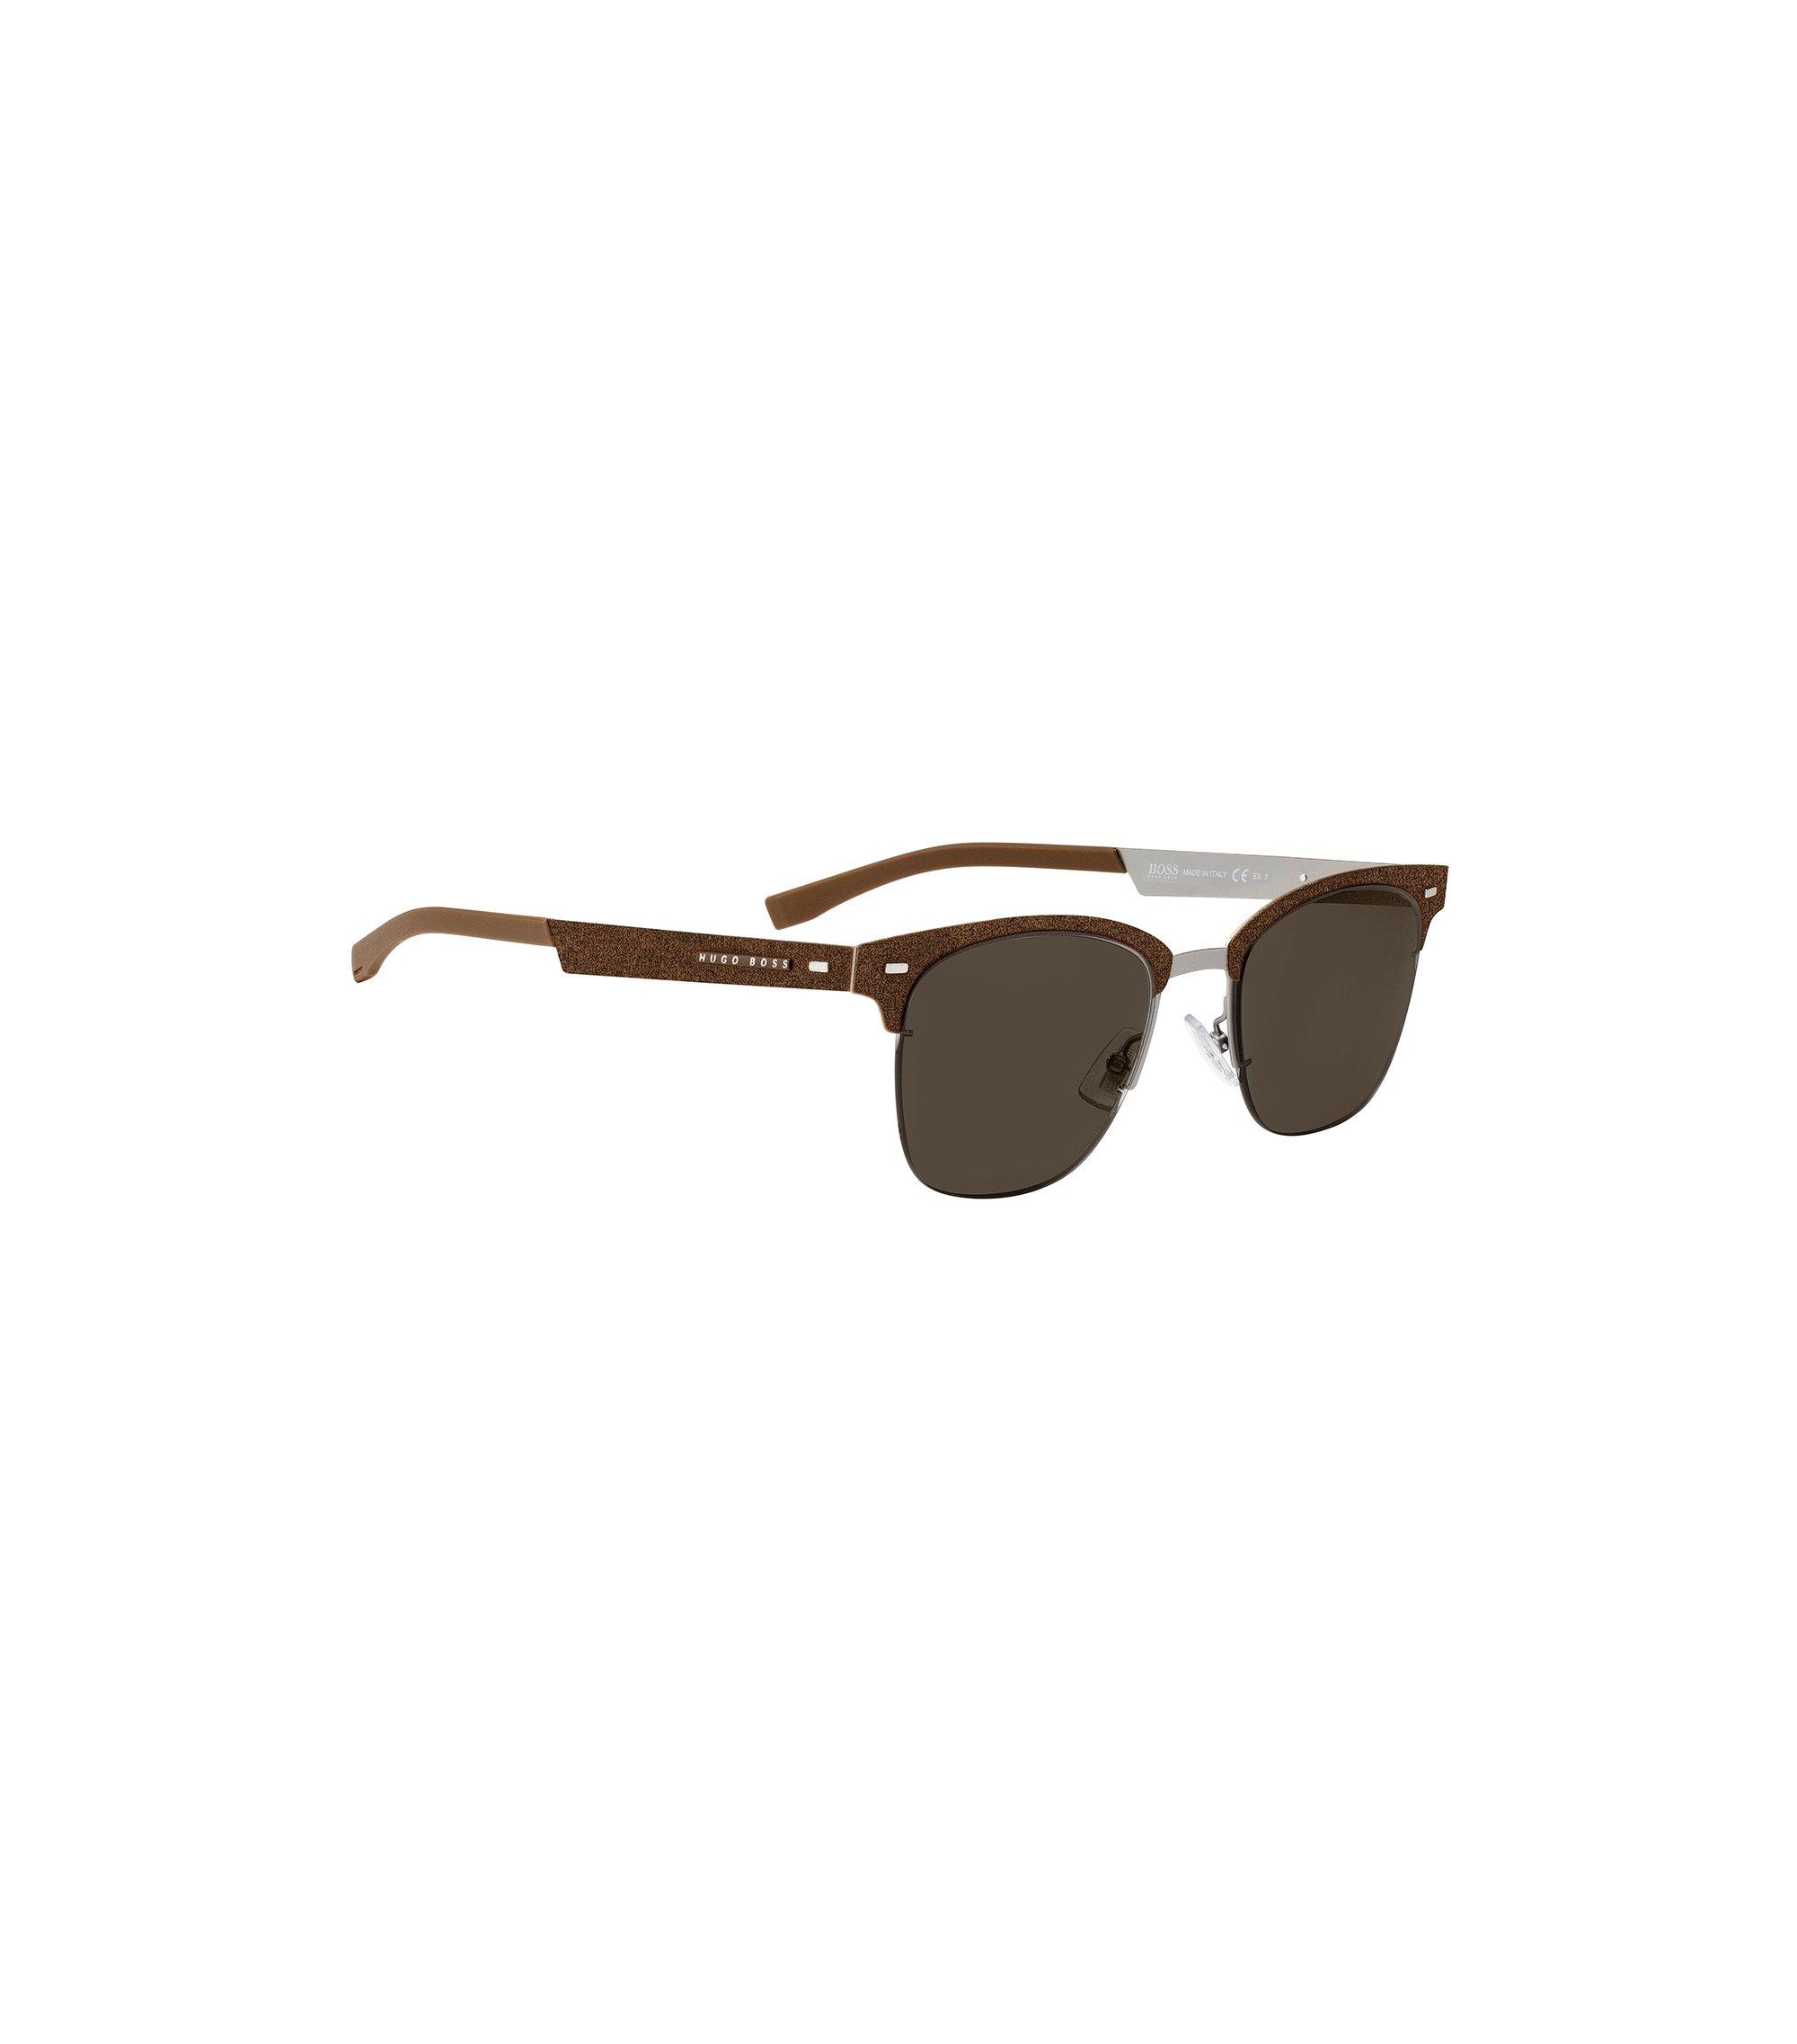 Ultralichte zonnebril met alcantaradetail, Bruin